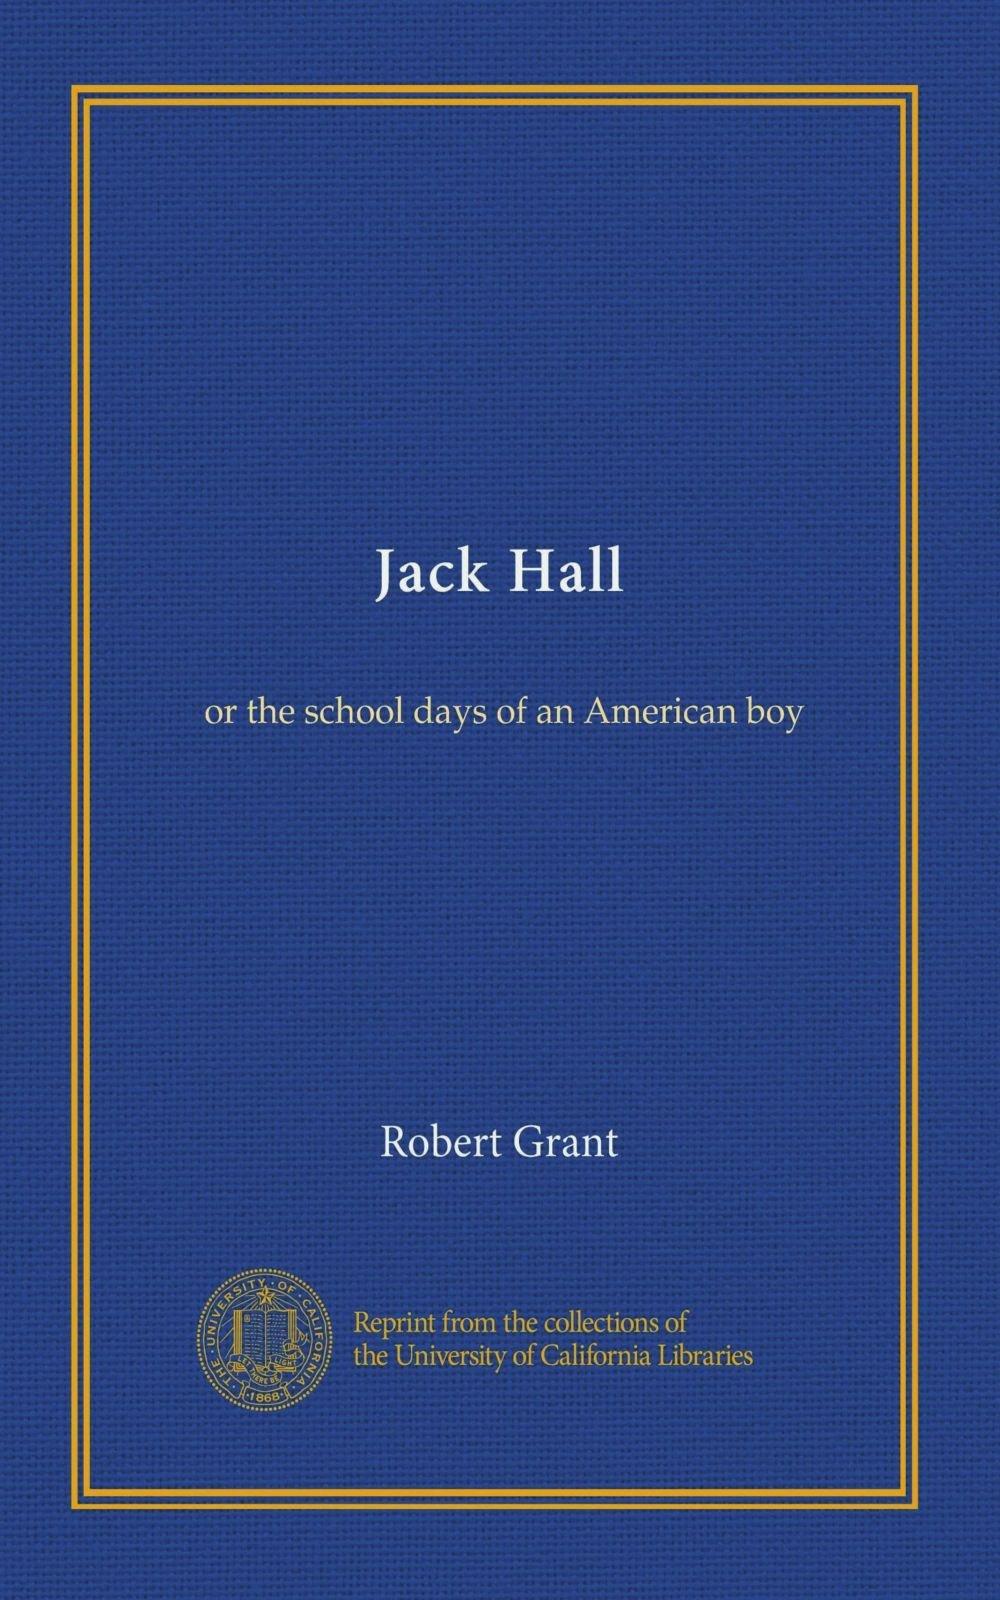 Jack Hall: or the school days of an American boy PDF